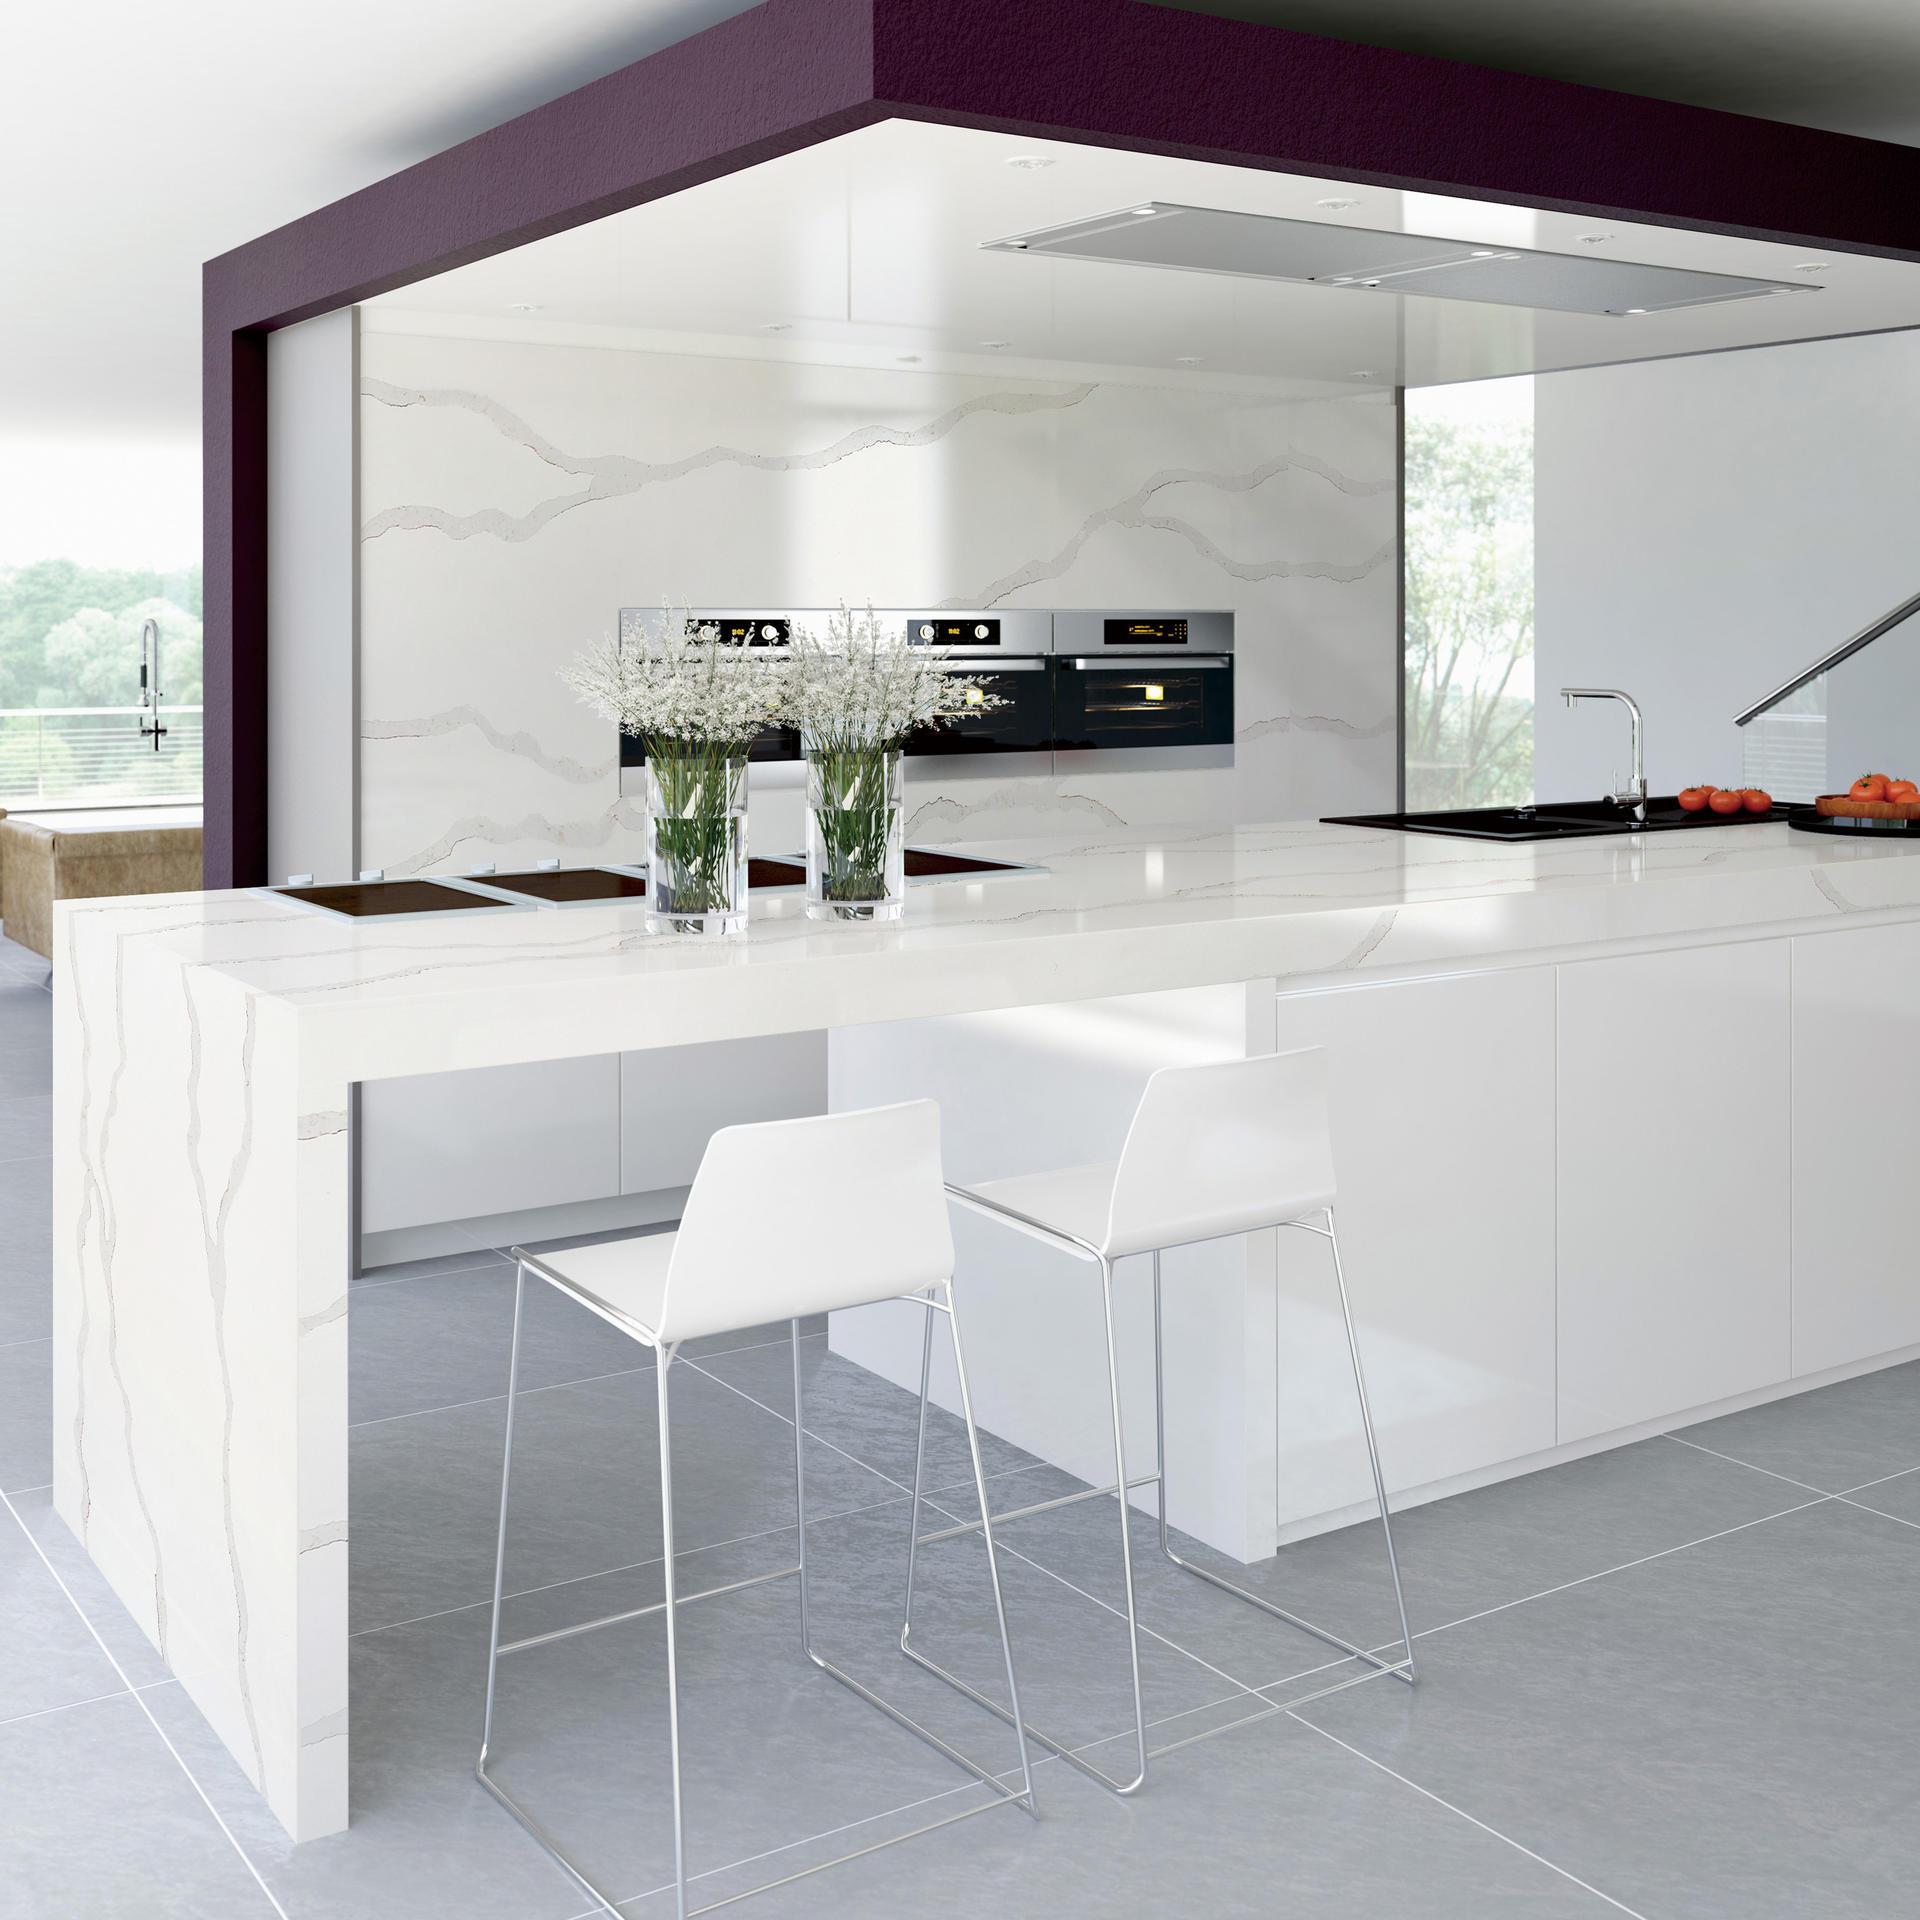 LK-Calacatta White Grey Marble Artificial Stone Molds Polished Vanity Countertop Bathroom Kitchen Engineered Stone Jumbo Slab